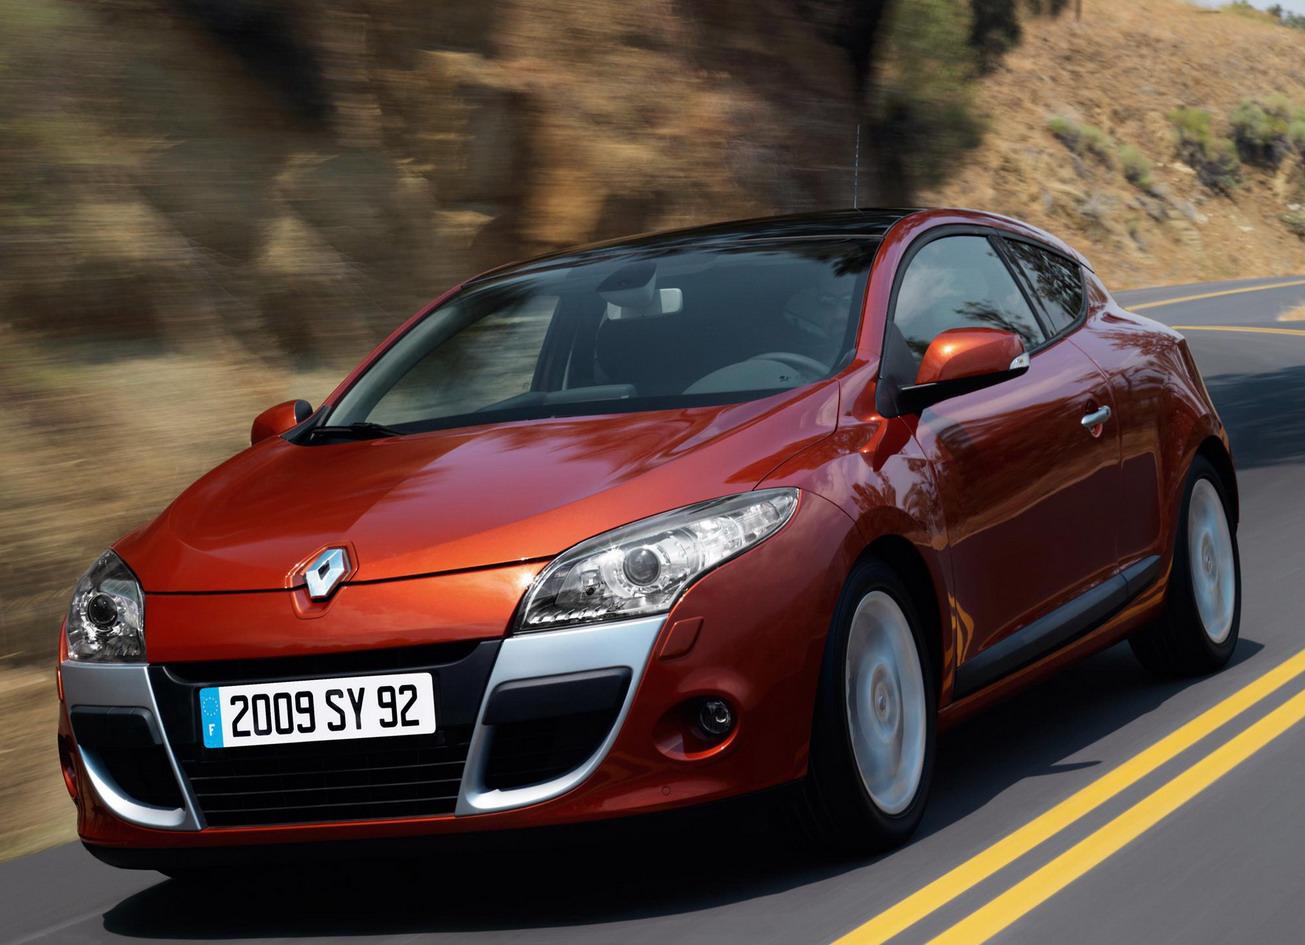 Renault-Megane-Coupe-Carscoop2.jpg